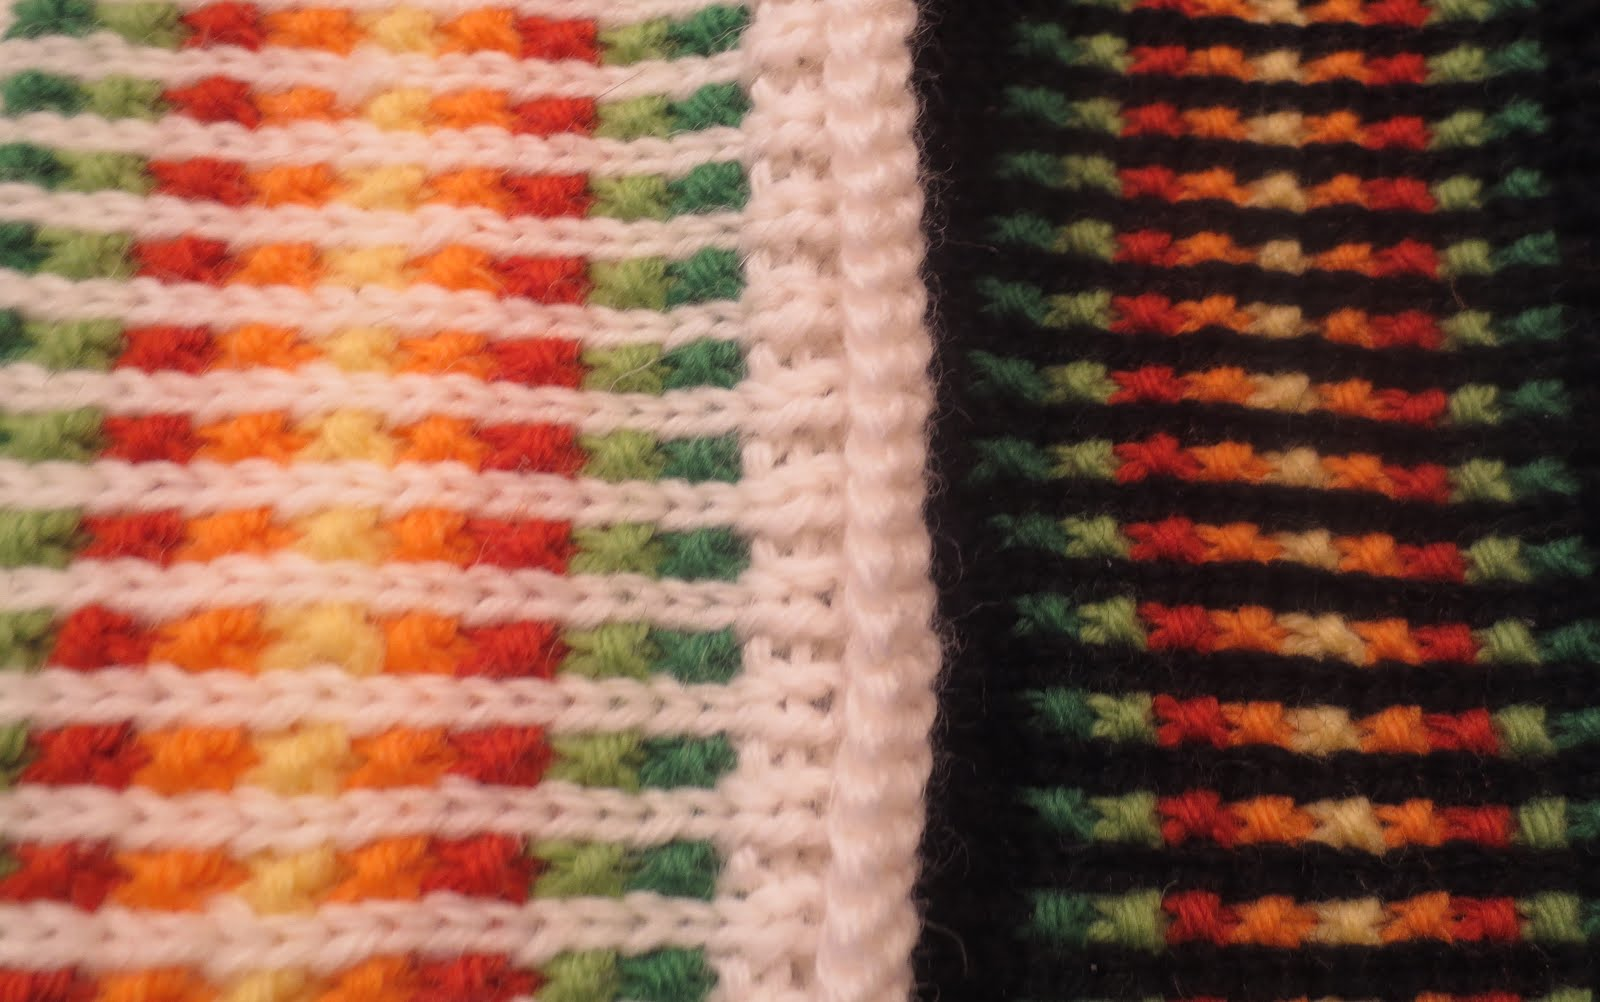 Knitting Ribbing Tips : Techknitting corrugated ribbing tricks and tips